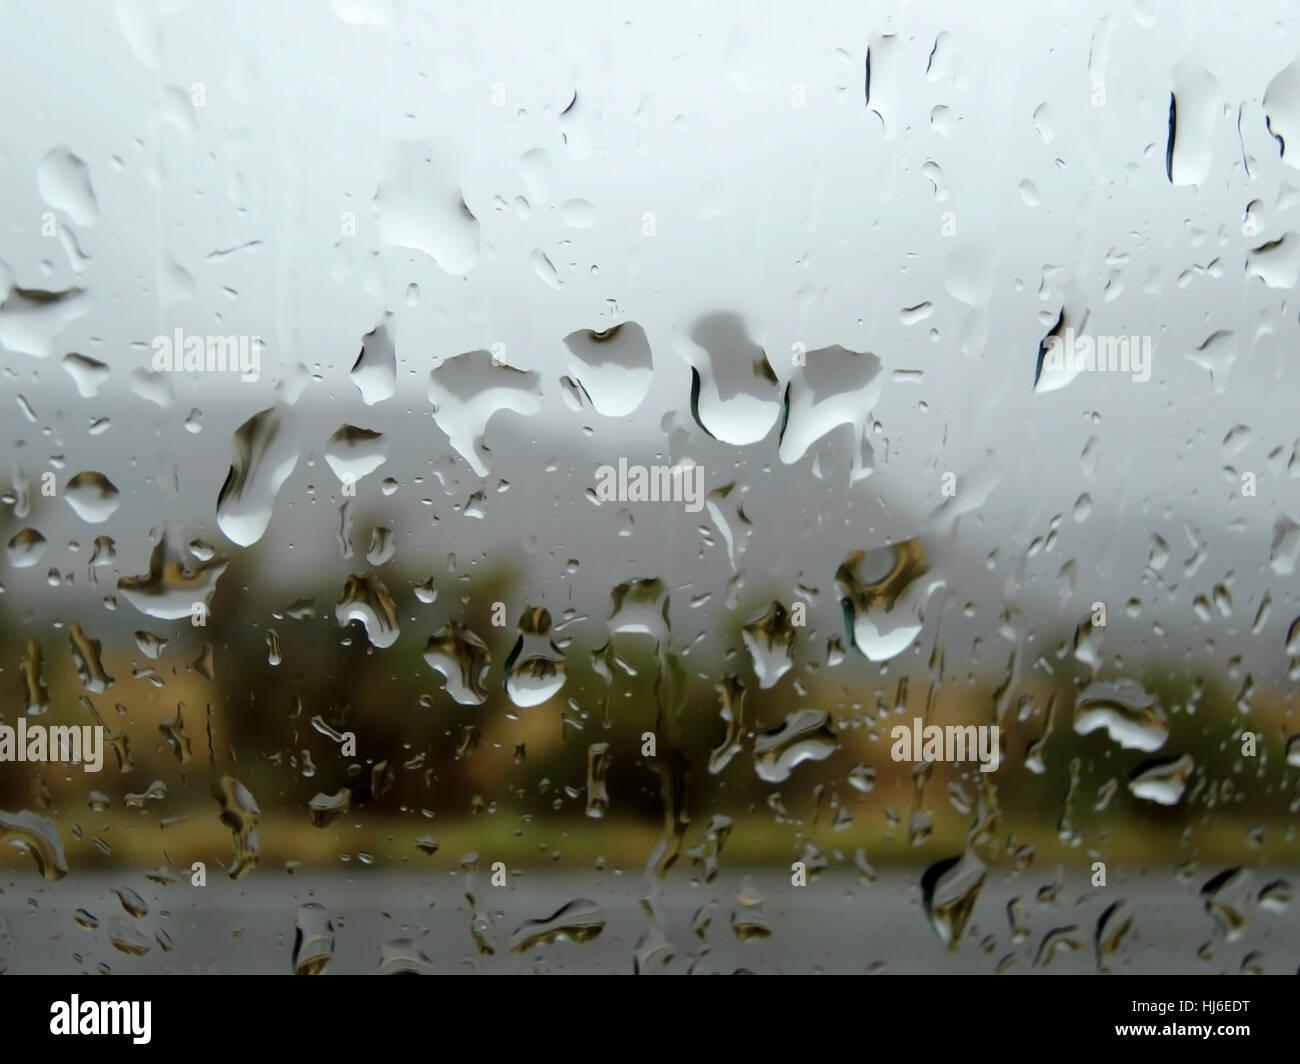 pattern, backdrop, background, texture, glass, chalice, tumbler, arrangement, - Stock Image